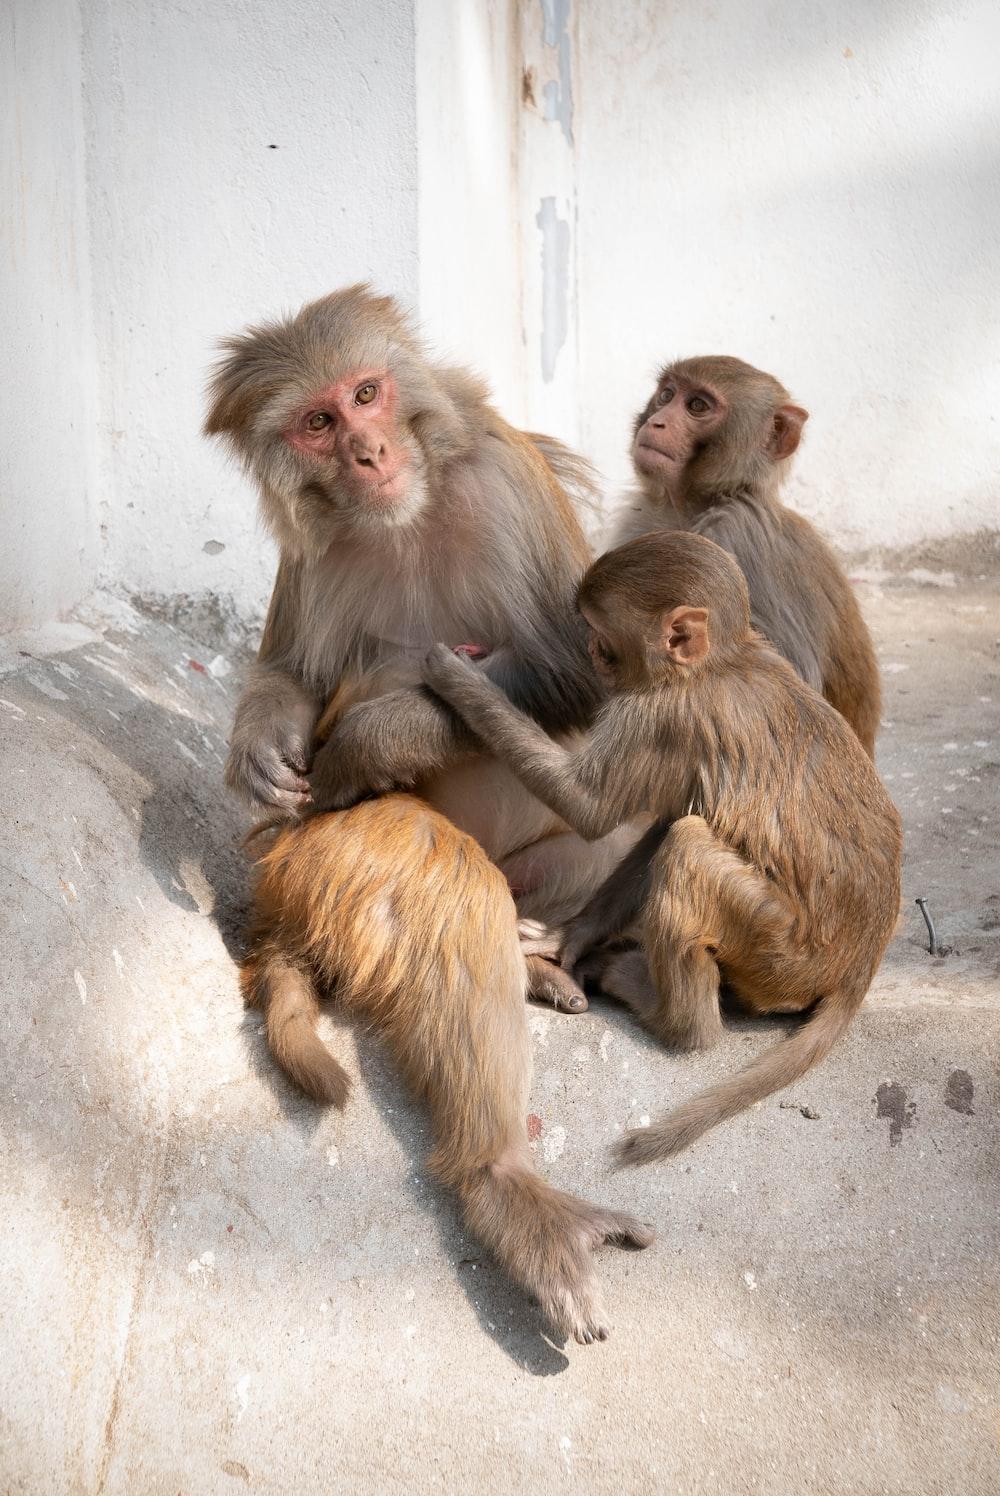 adult monkey surrounded by baby monkeys